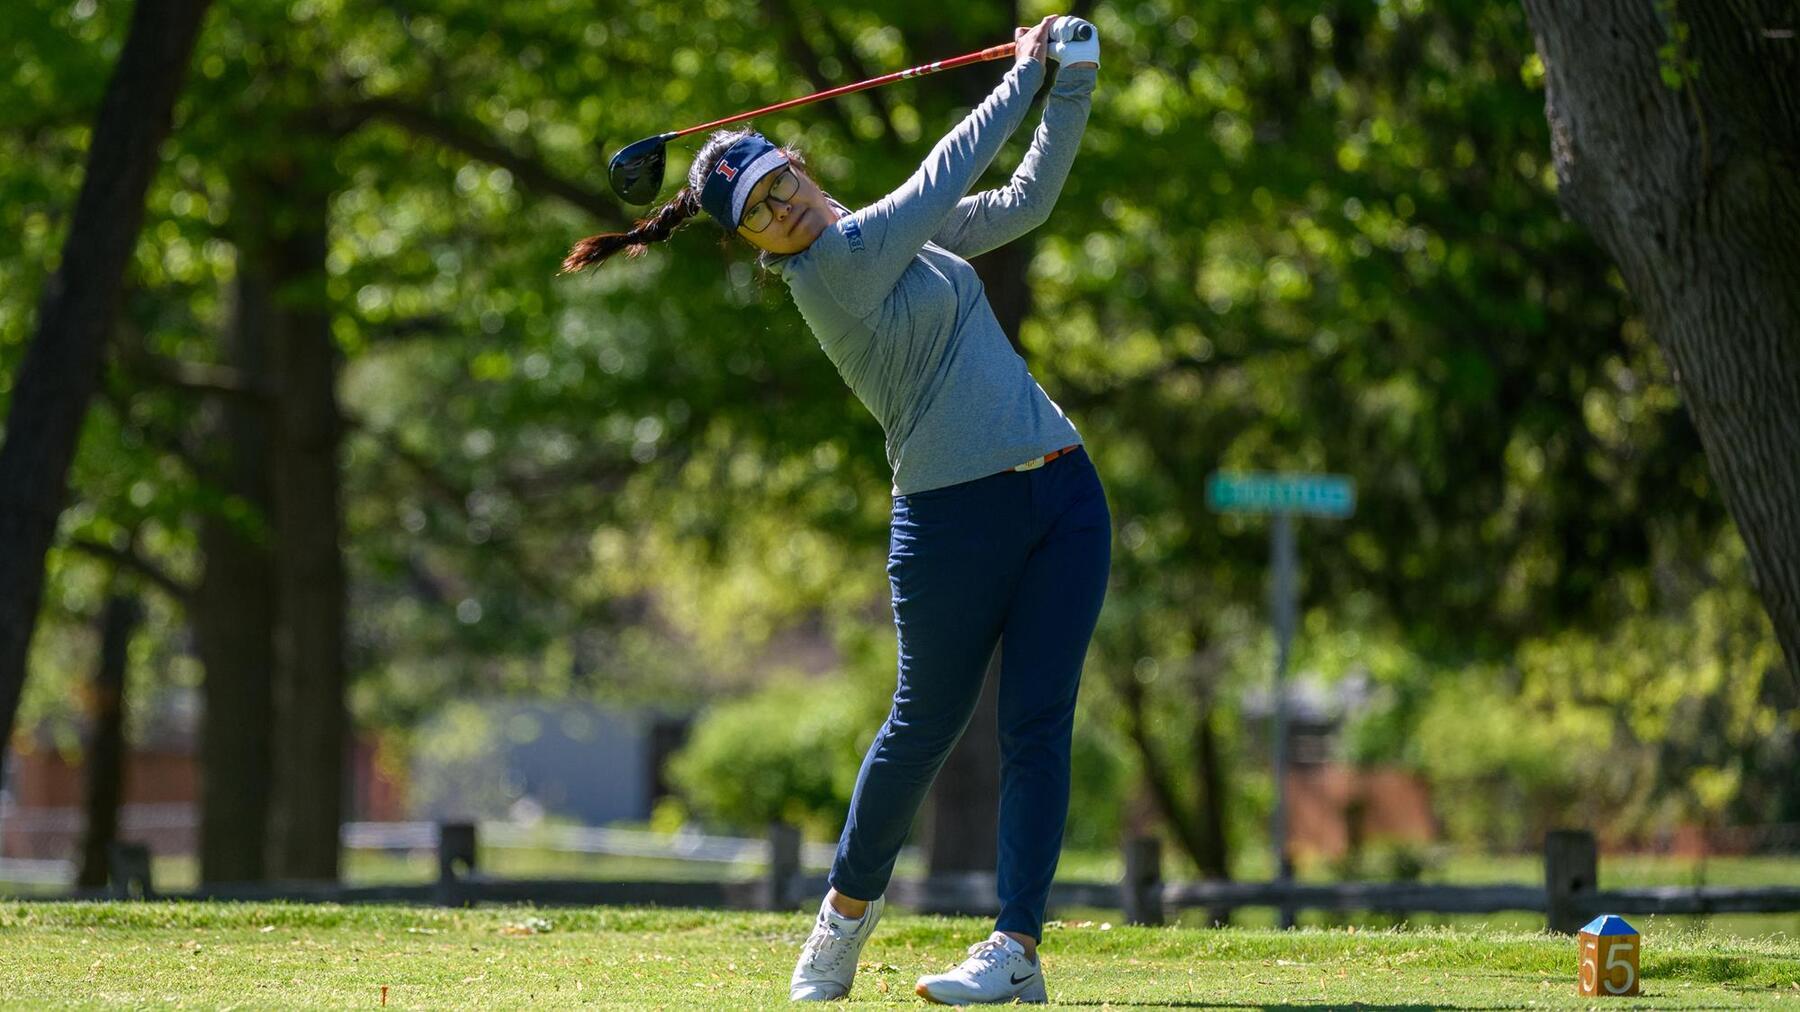 Junior golfer Chrystal Wang tees off